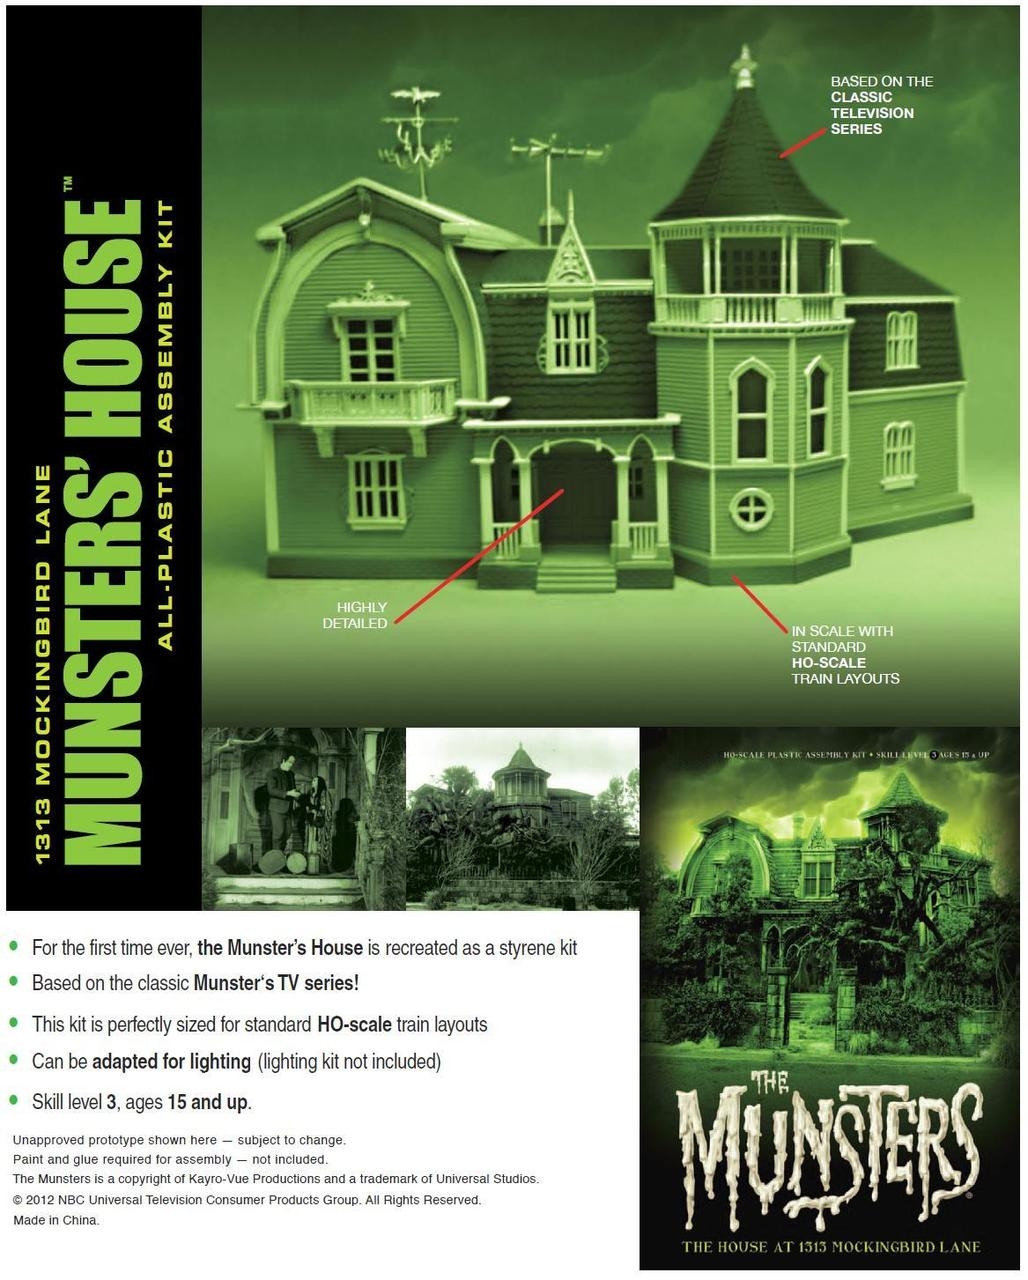 The Munsters House Model Kit